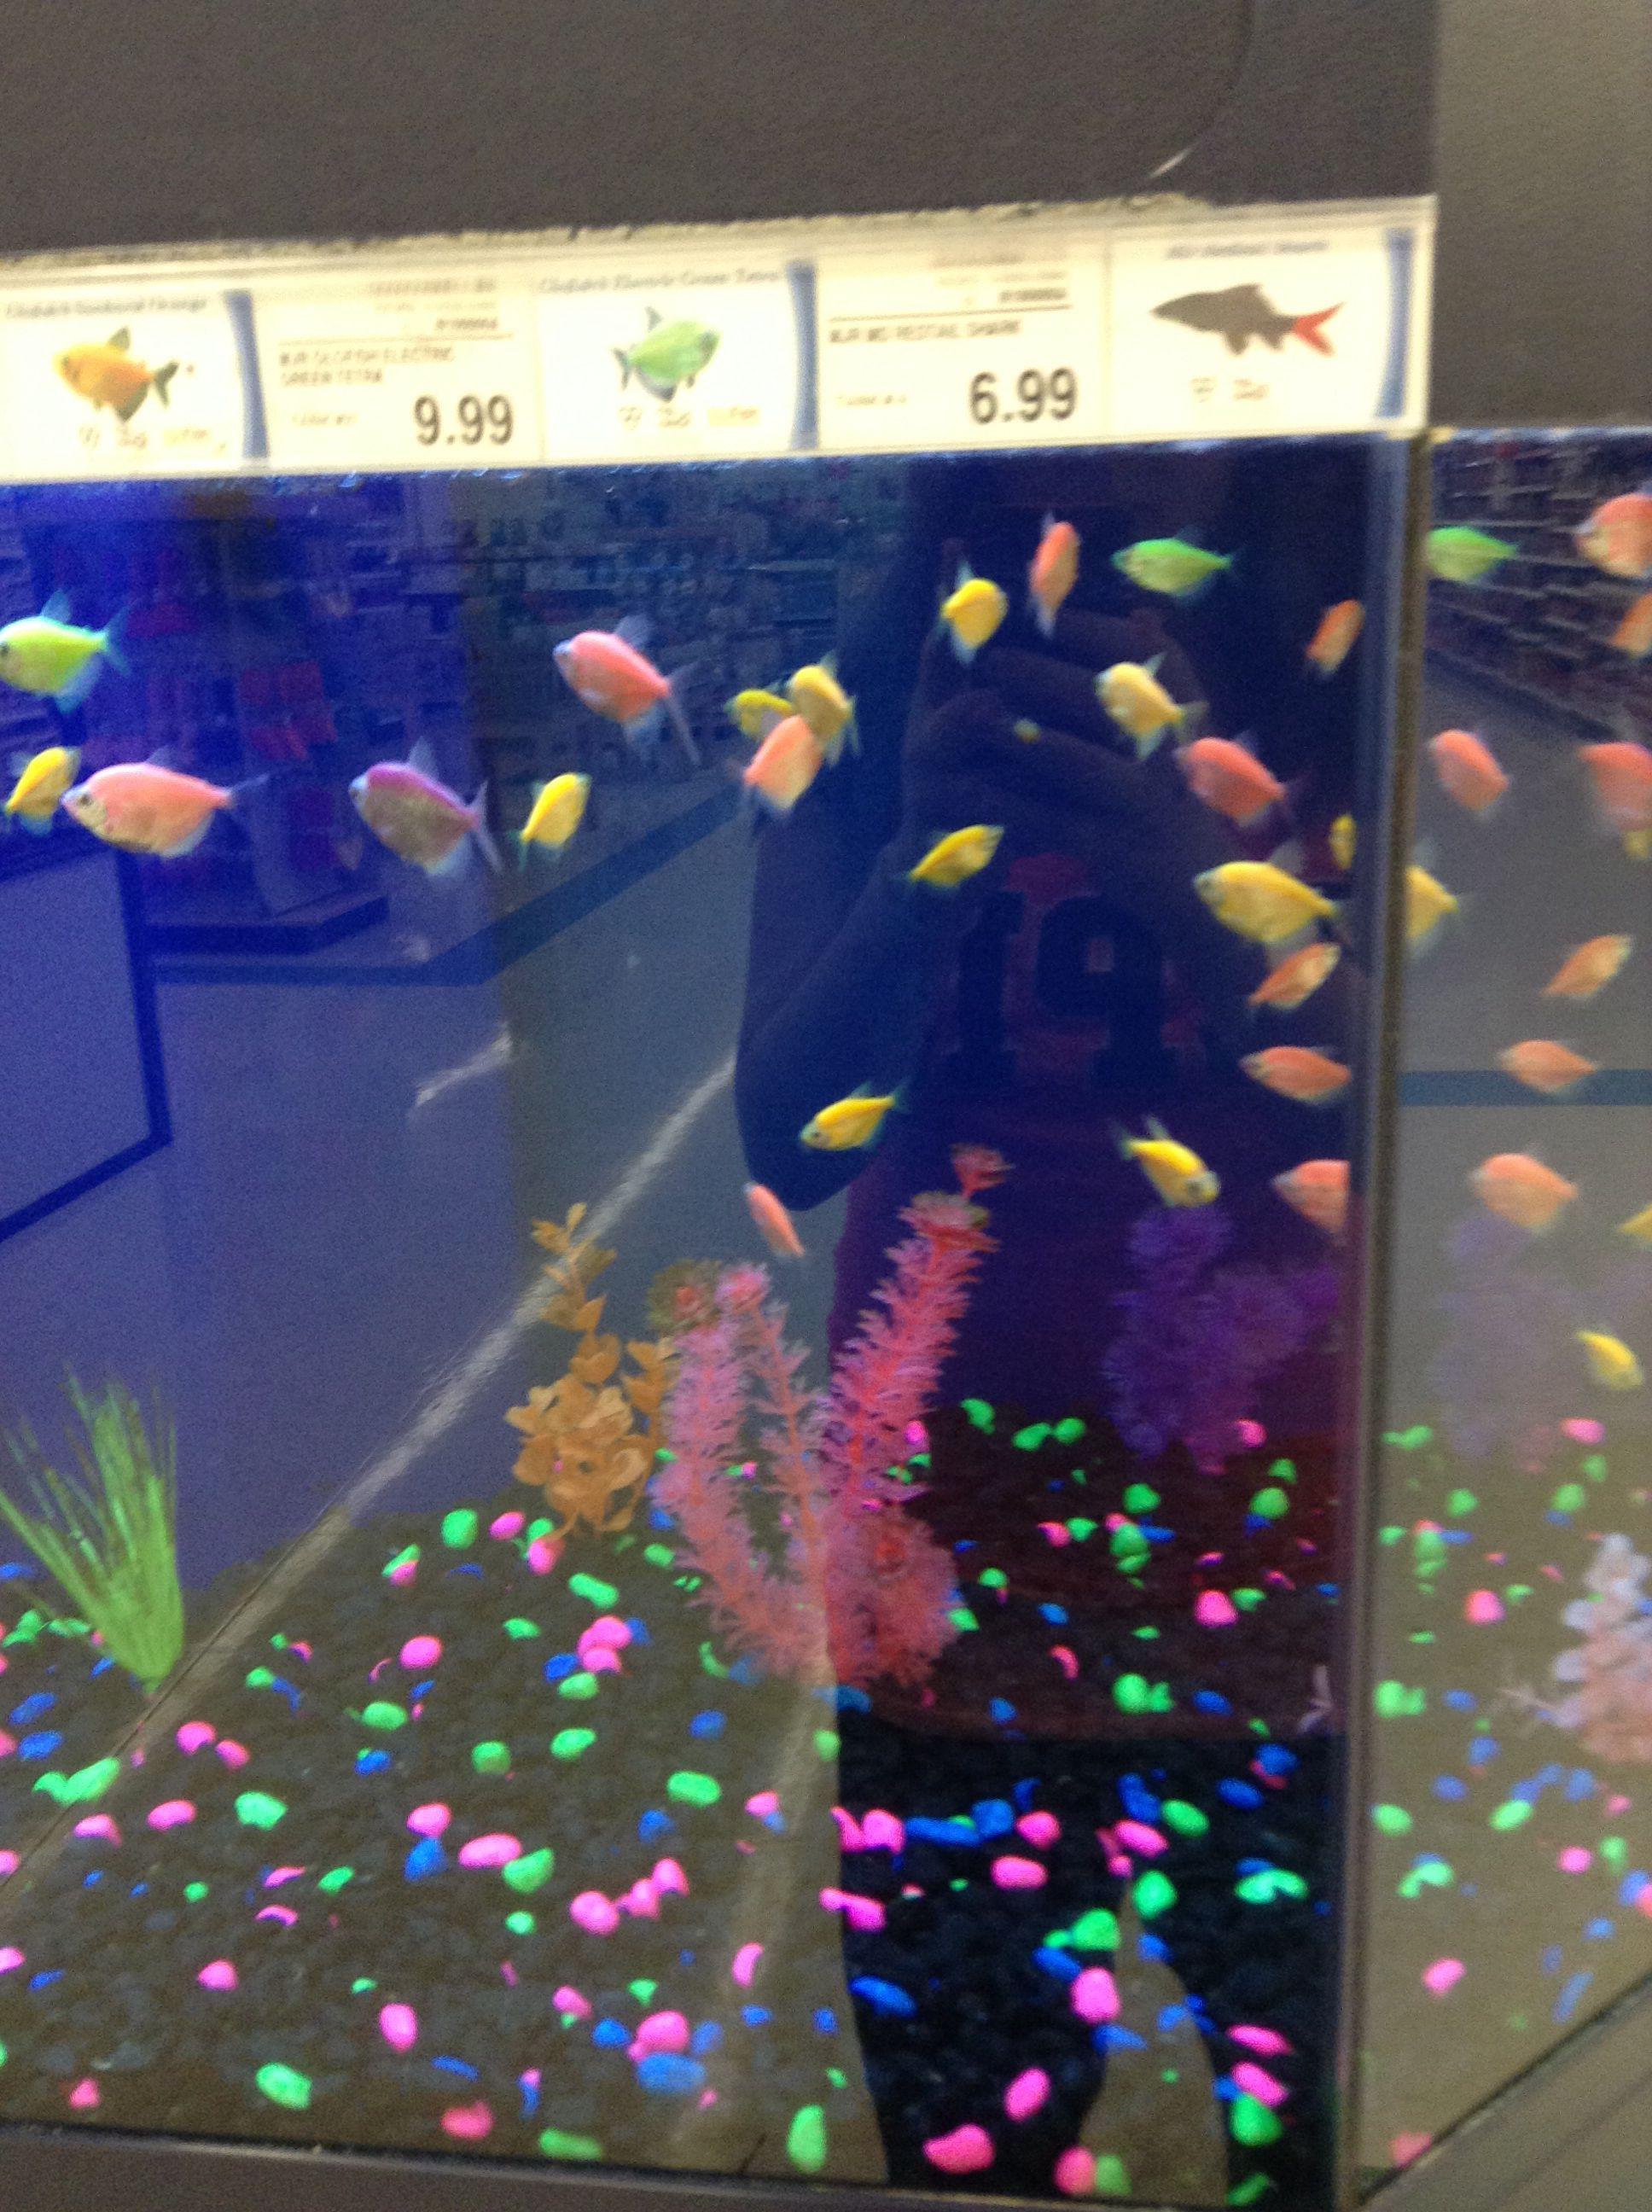 Types of pet fish at walmart for Types of fish at walmart